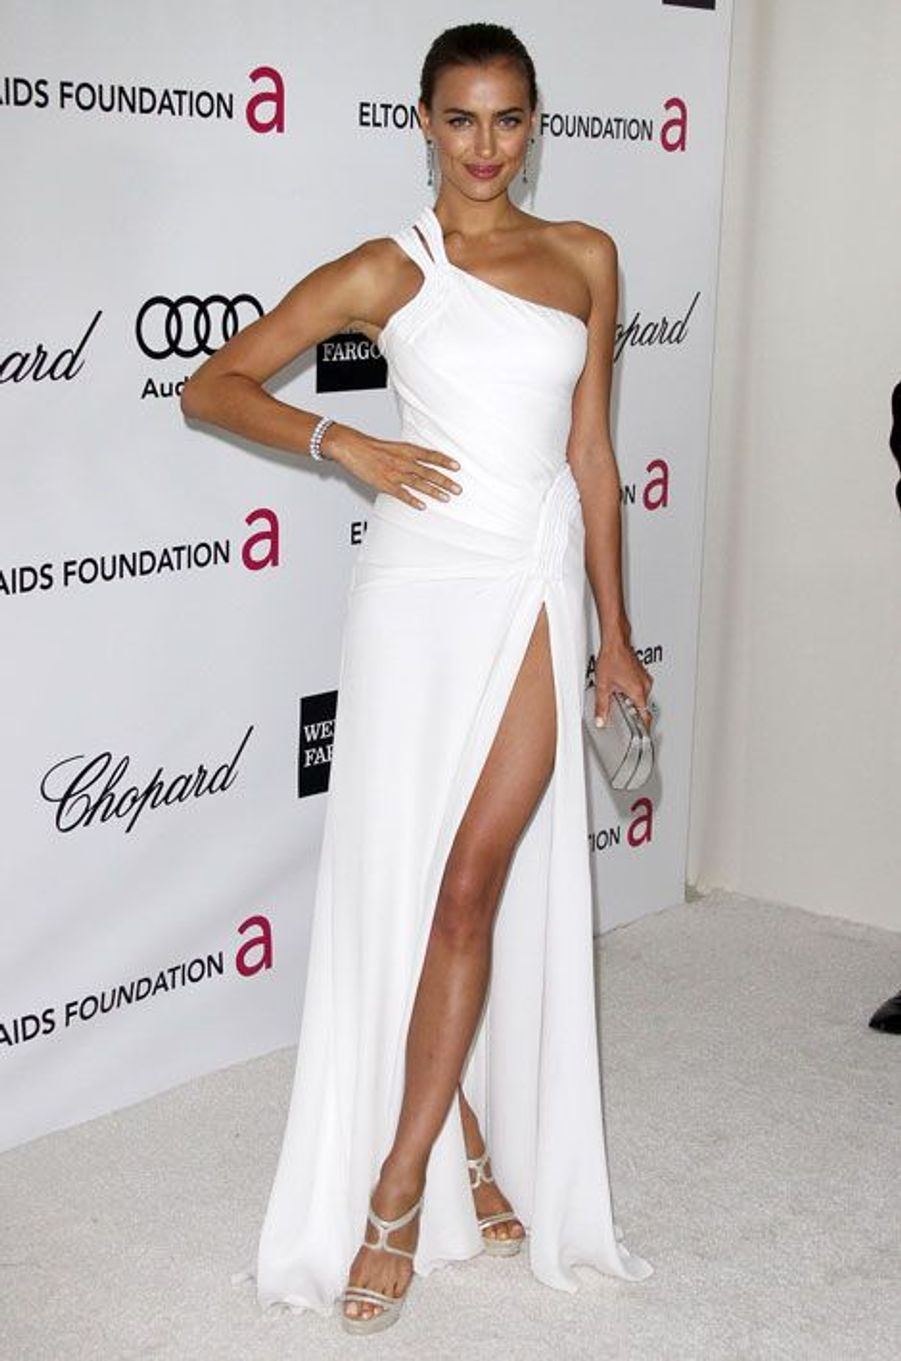 Toujours sexy en blanc, lors du gala de la fondation Elton John contre le sida en 2012